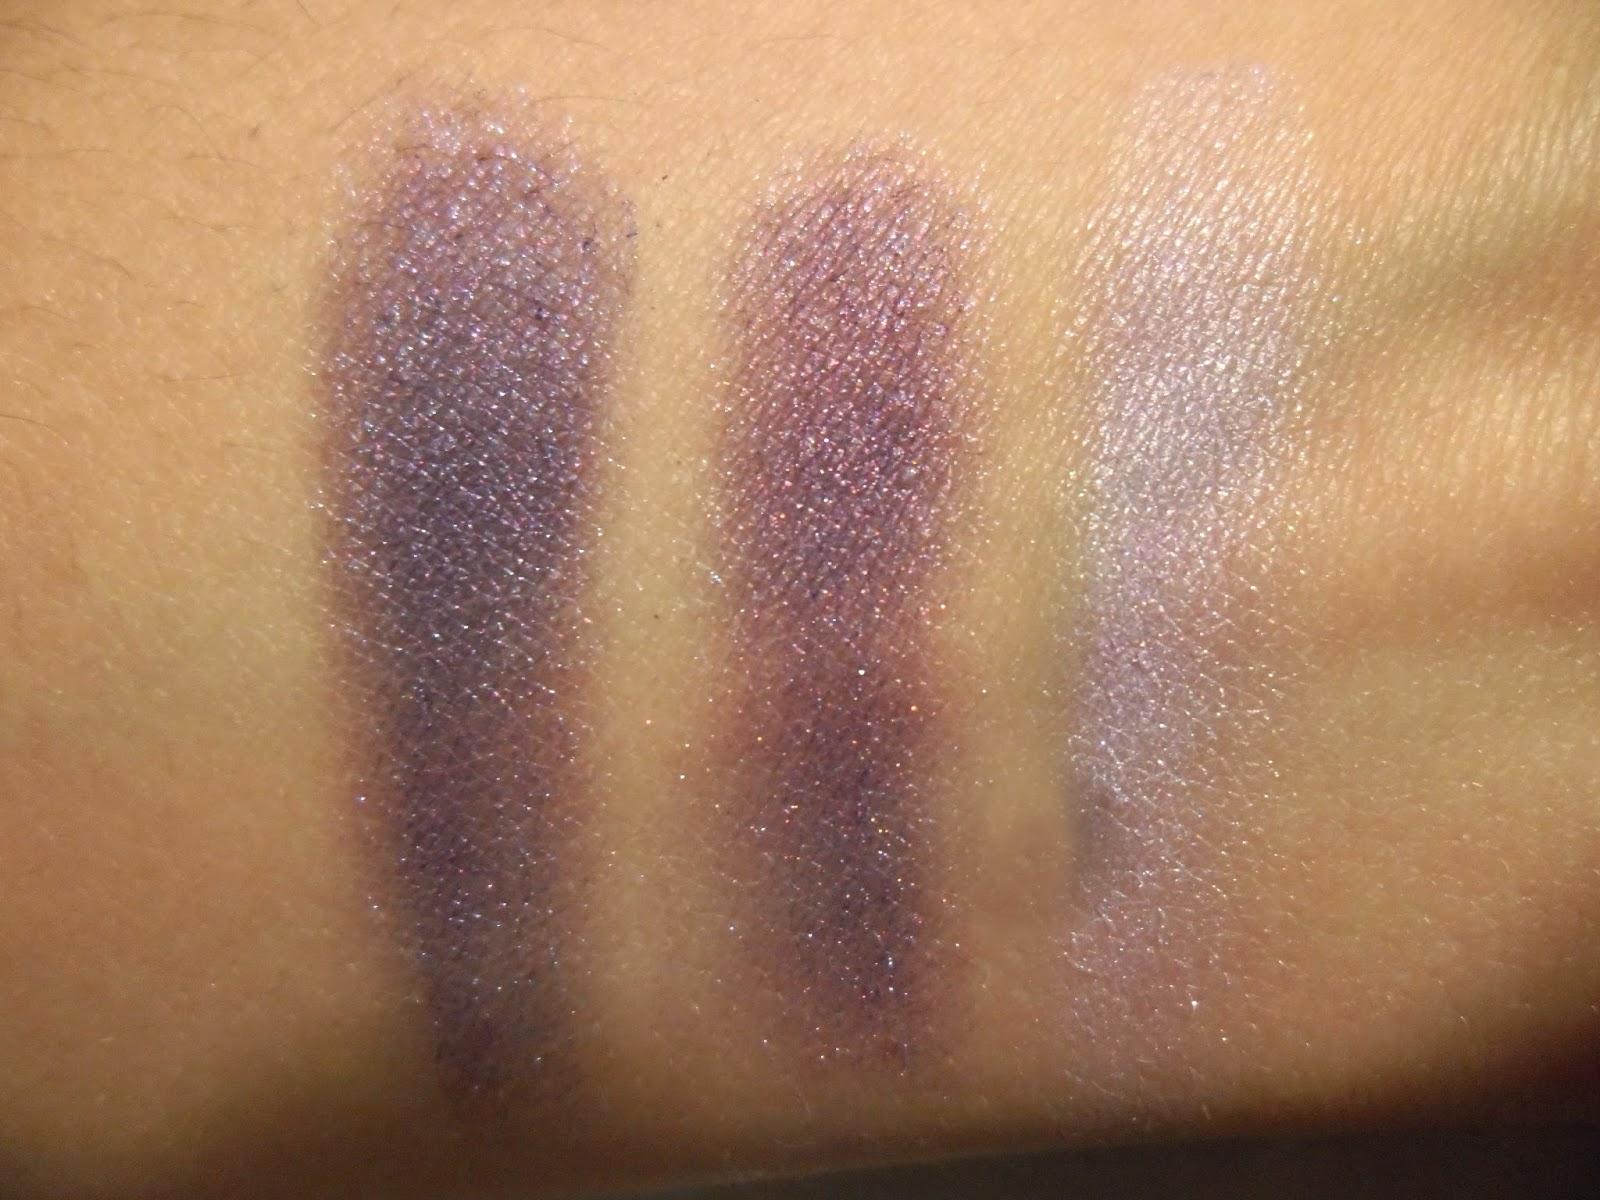 Shiseido trio de sombras